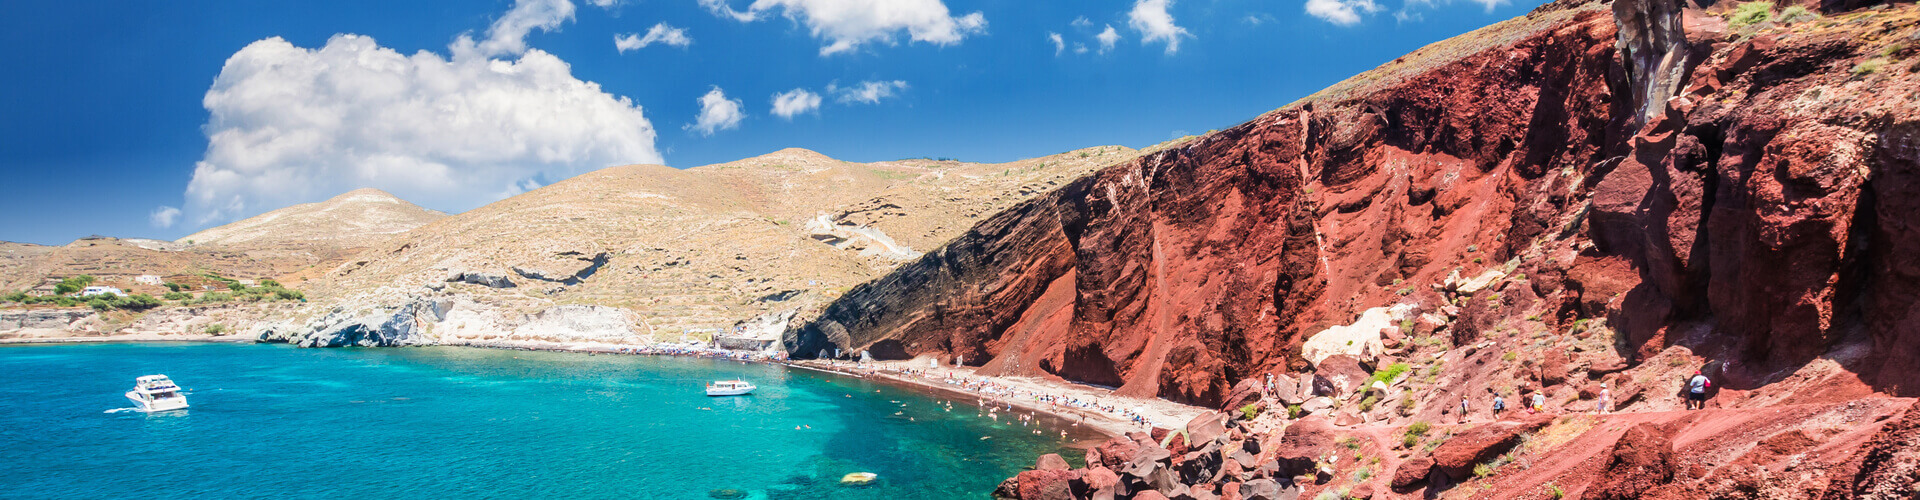 Best-Beaches-in-Santorini-Kamari-Tours-Excursions